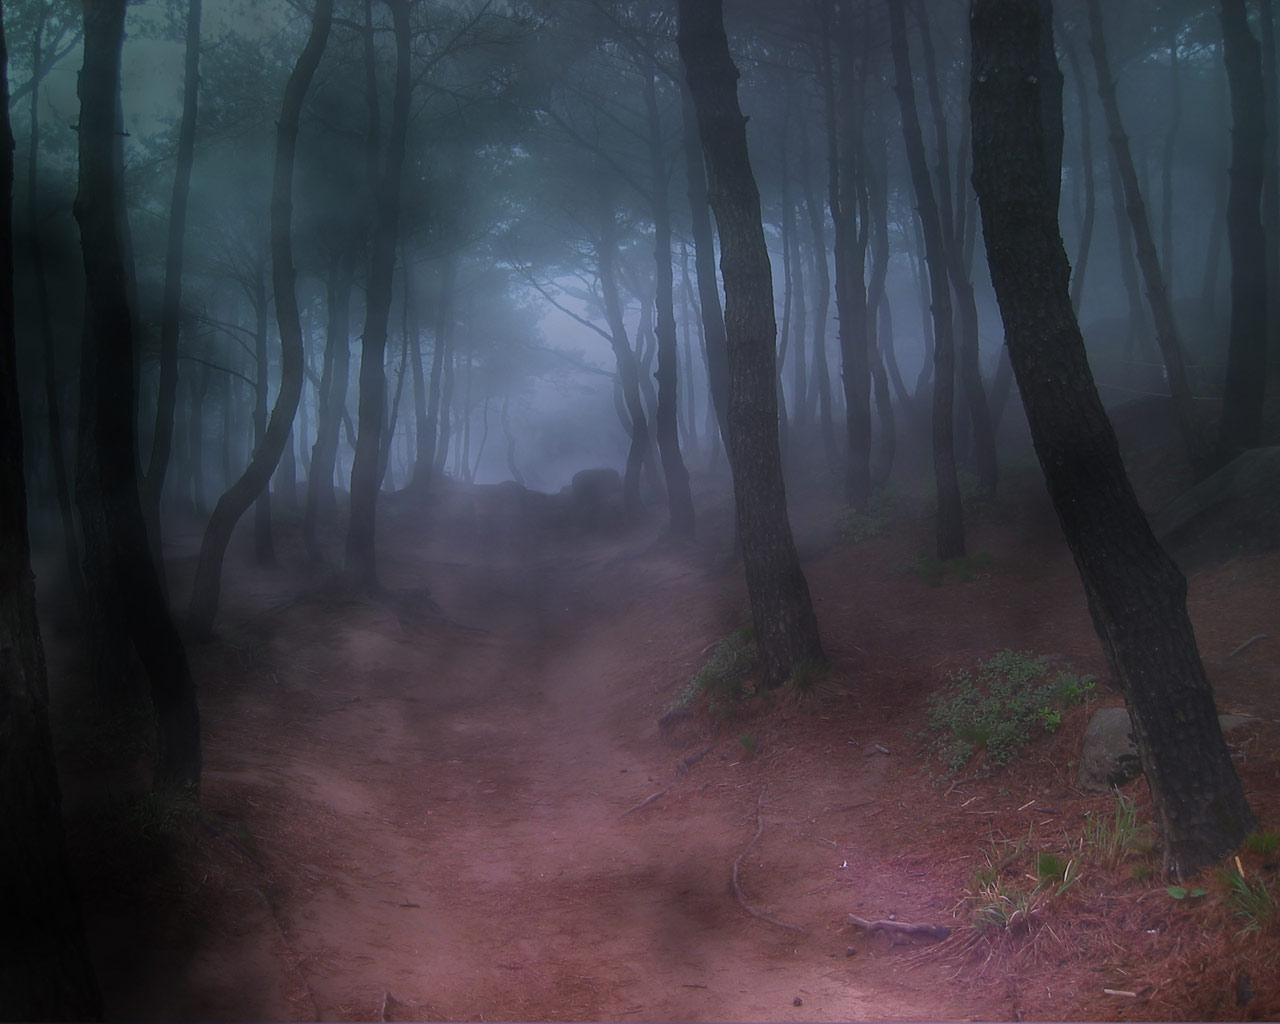 darkness-fog-wallpaper-wp424852-1